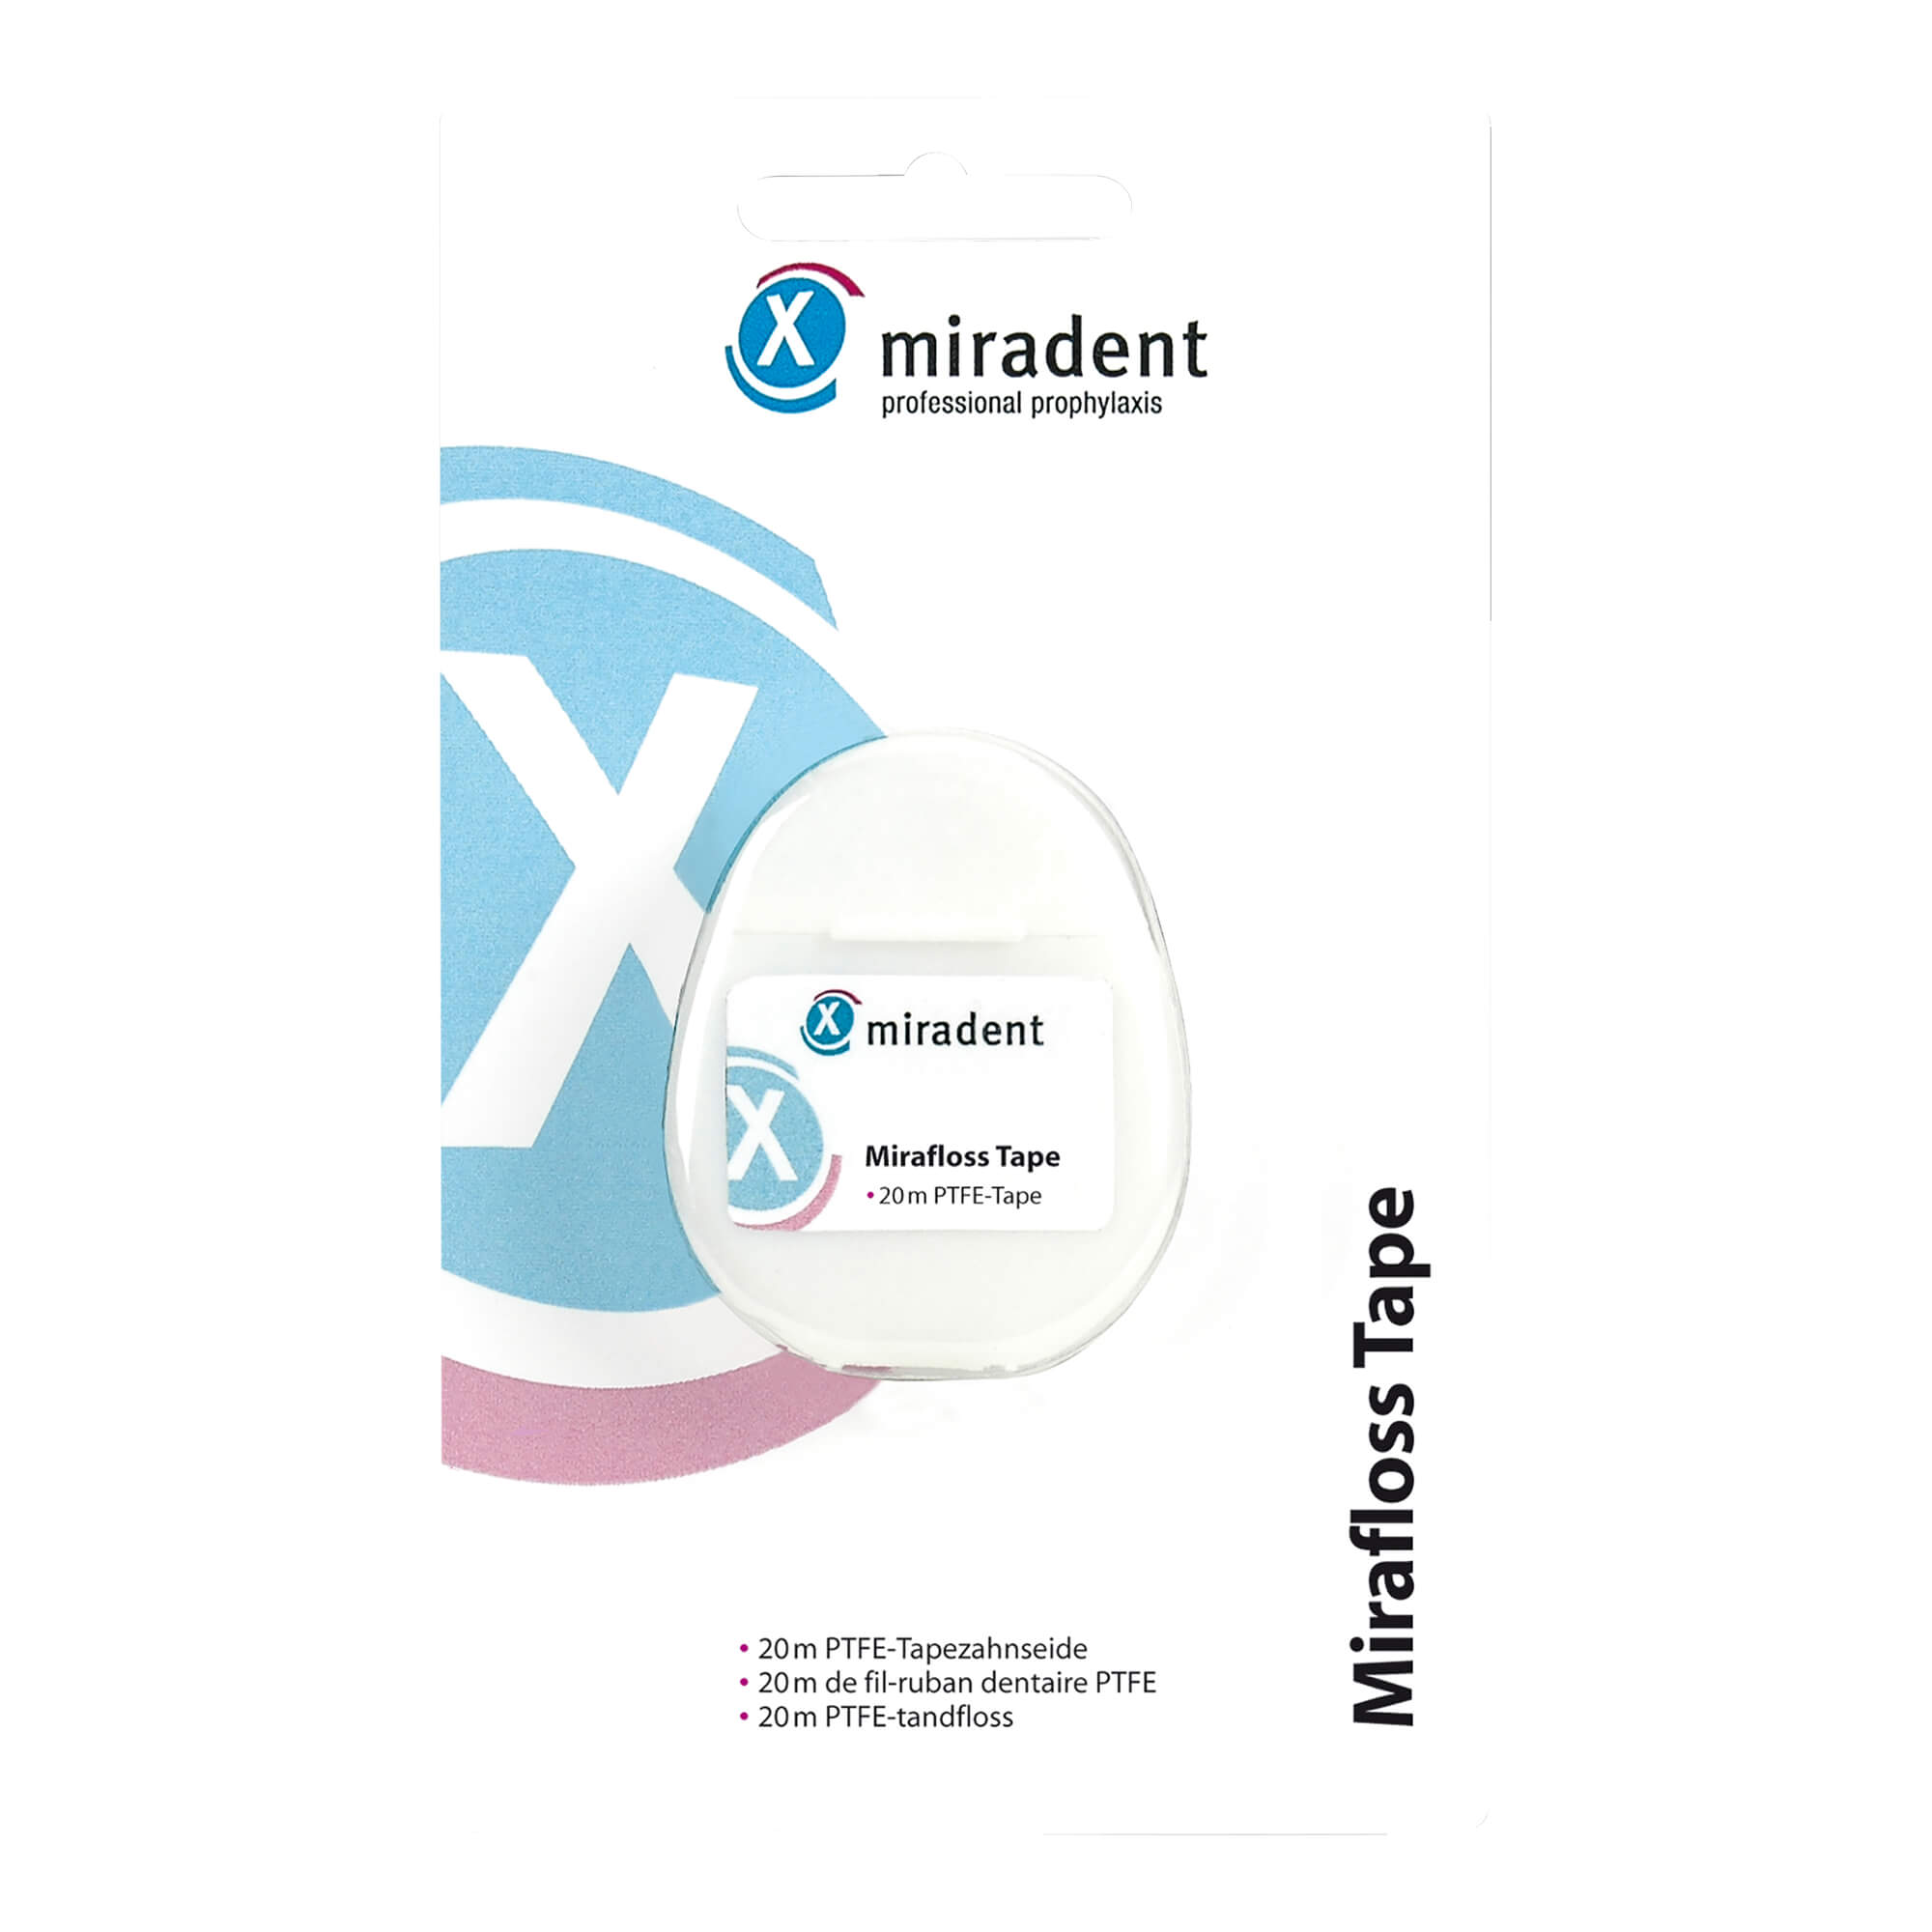 Miradent Mirafloss Tape